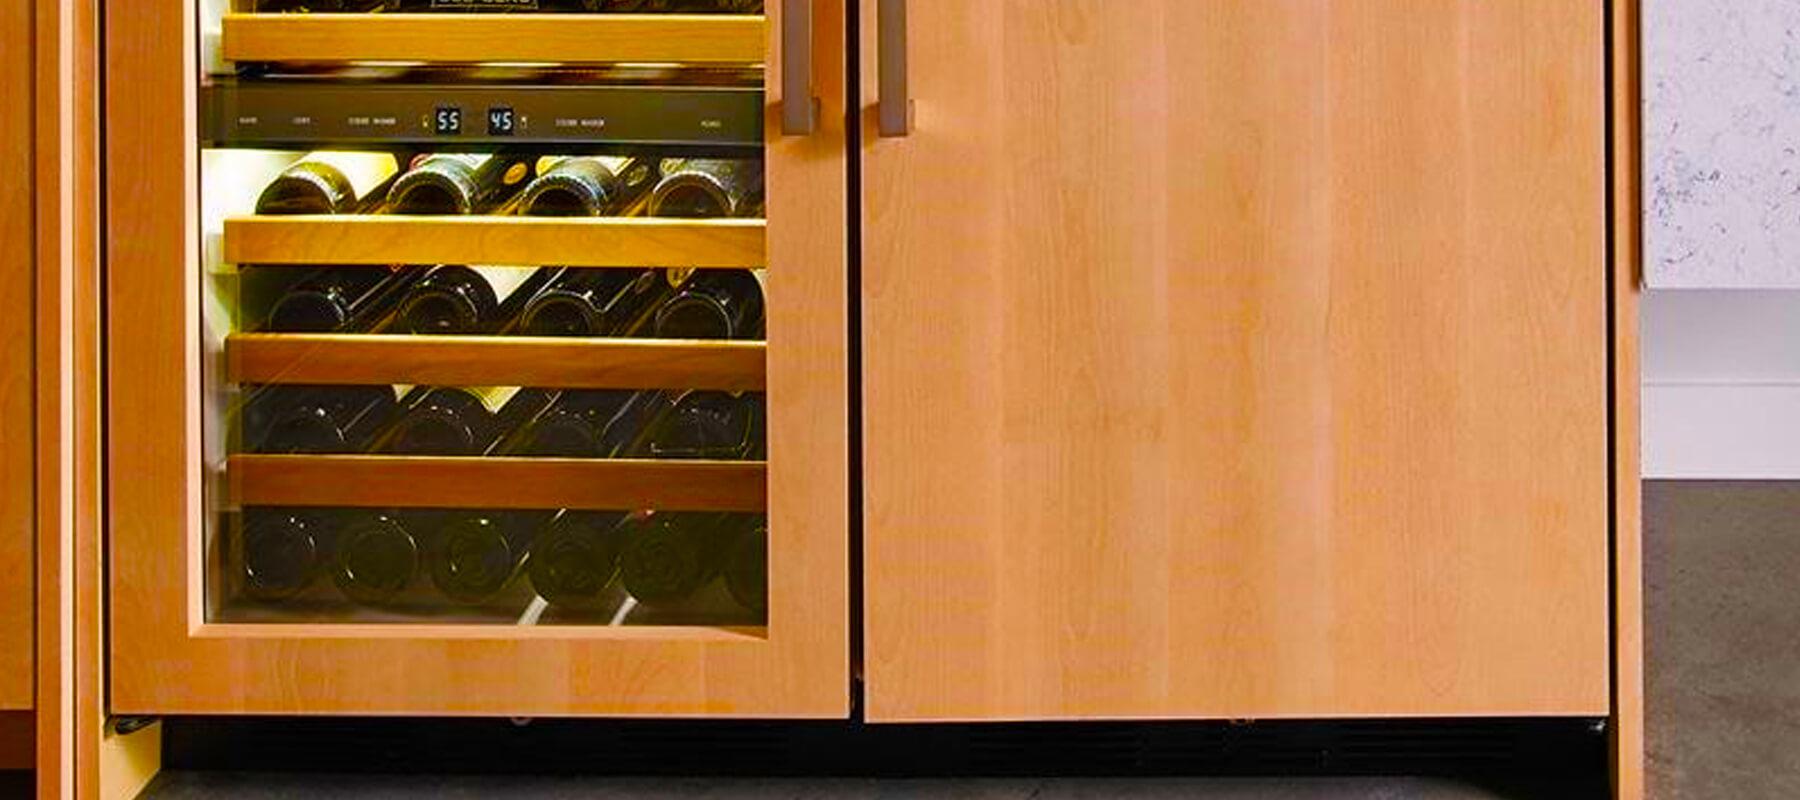 Built in Wine Refrigerator Undercounter Los Angeles | Built-in Refrigerator Repair